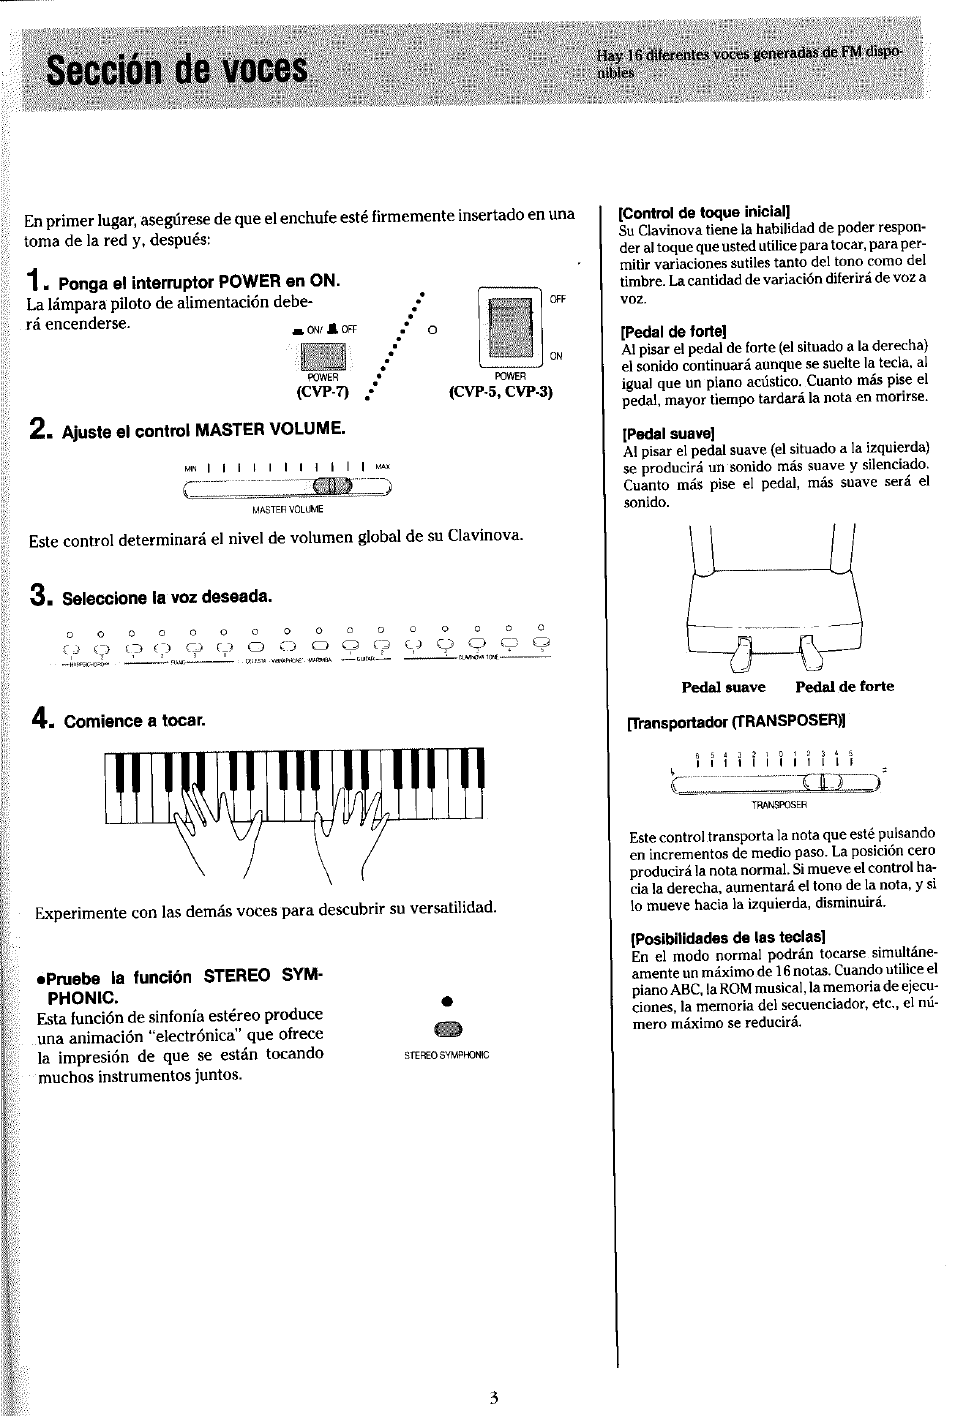 secci n de voces yamaha clavinova cvp 7 user manual page 7 22 rh manualsdir com Owner's Manual User Manual PDF